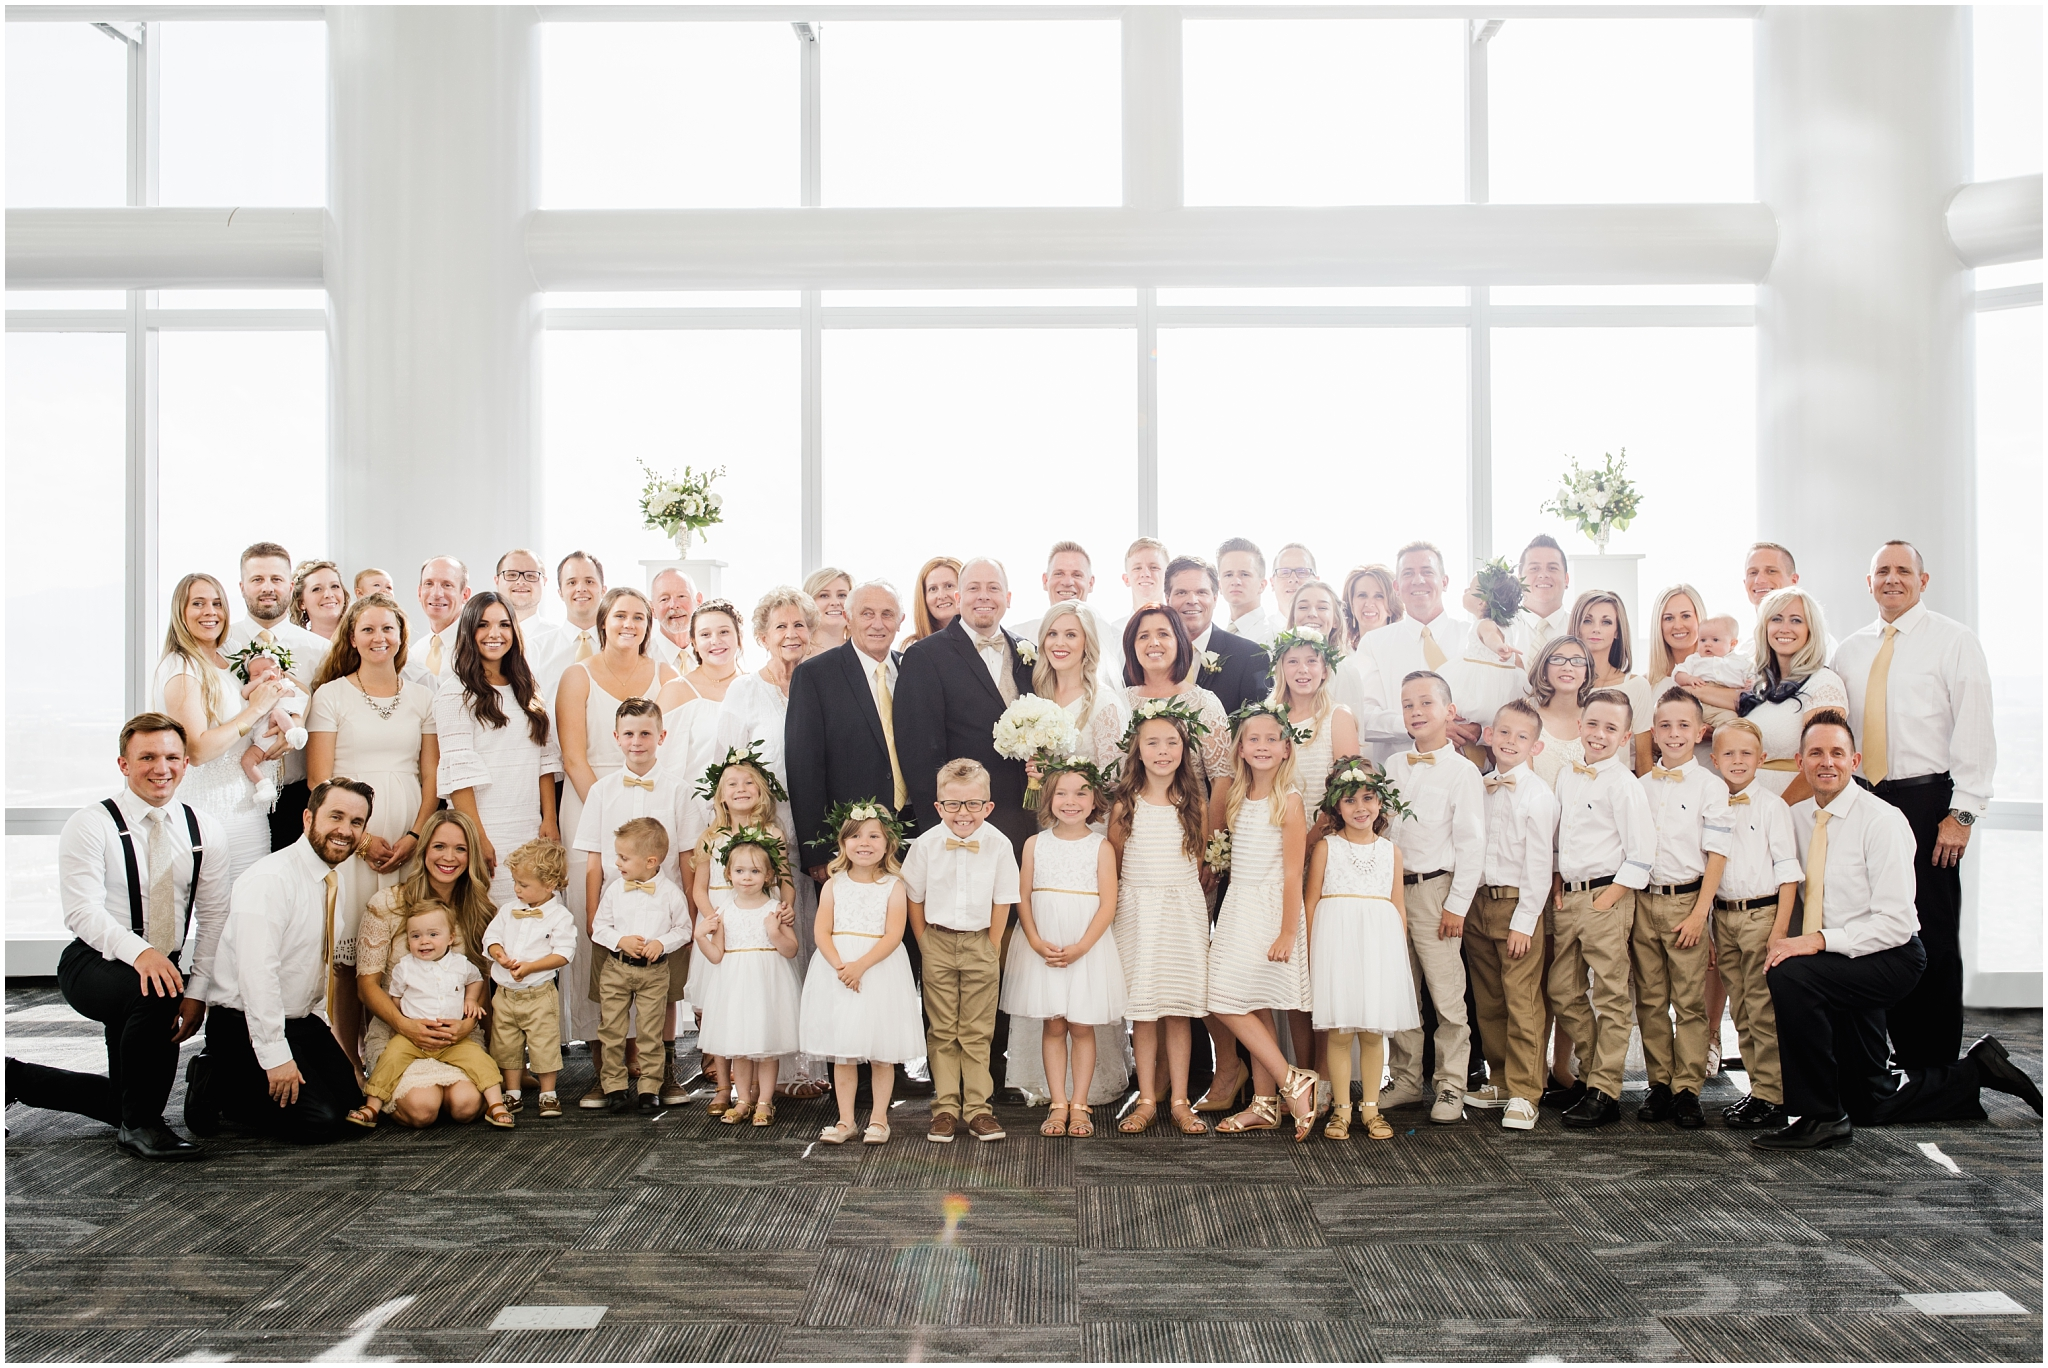 CherylandTyler-351_Lizzie-B-Imagery-Utah-Wedding-Photographer-Salt-Lake-City-Temple-Wells-Fargo-Building-Reception.jpg